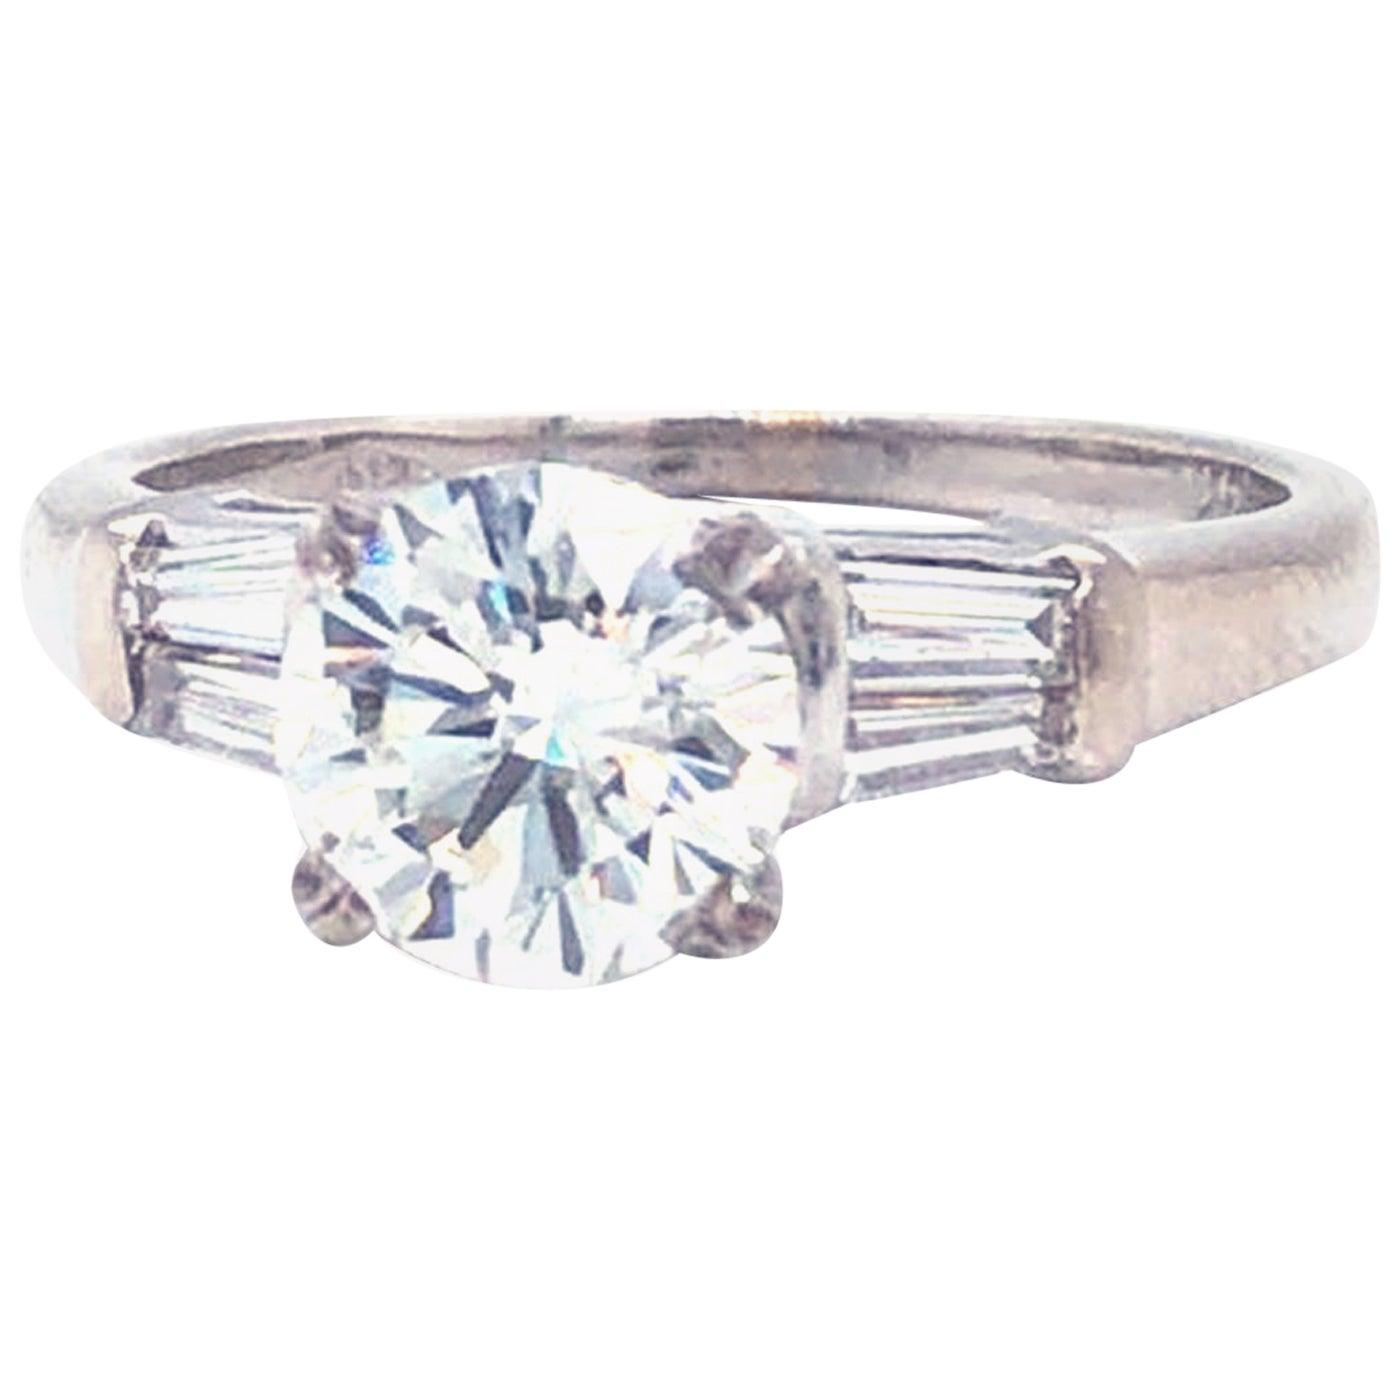 GIA Certified 1.20 Carat VS1 Round Tapered Baguette Platinum Diamond Ring